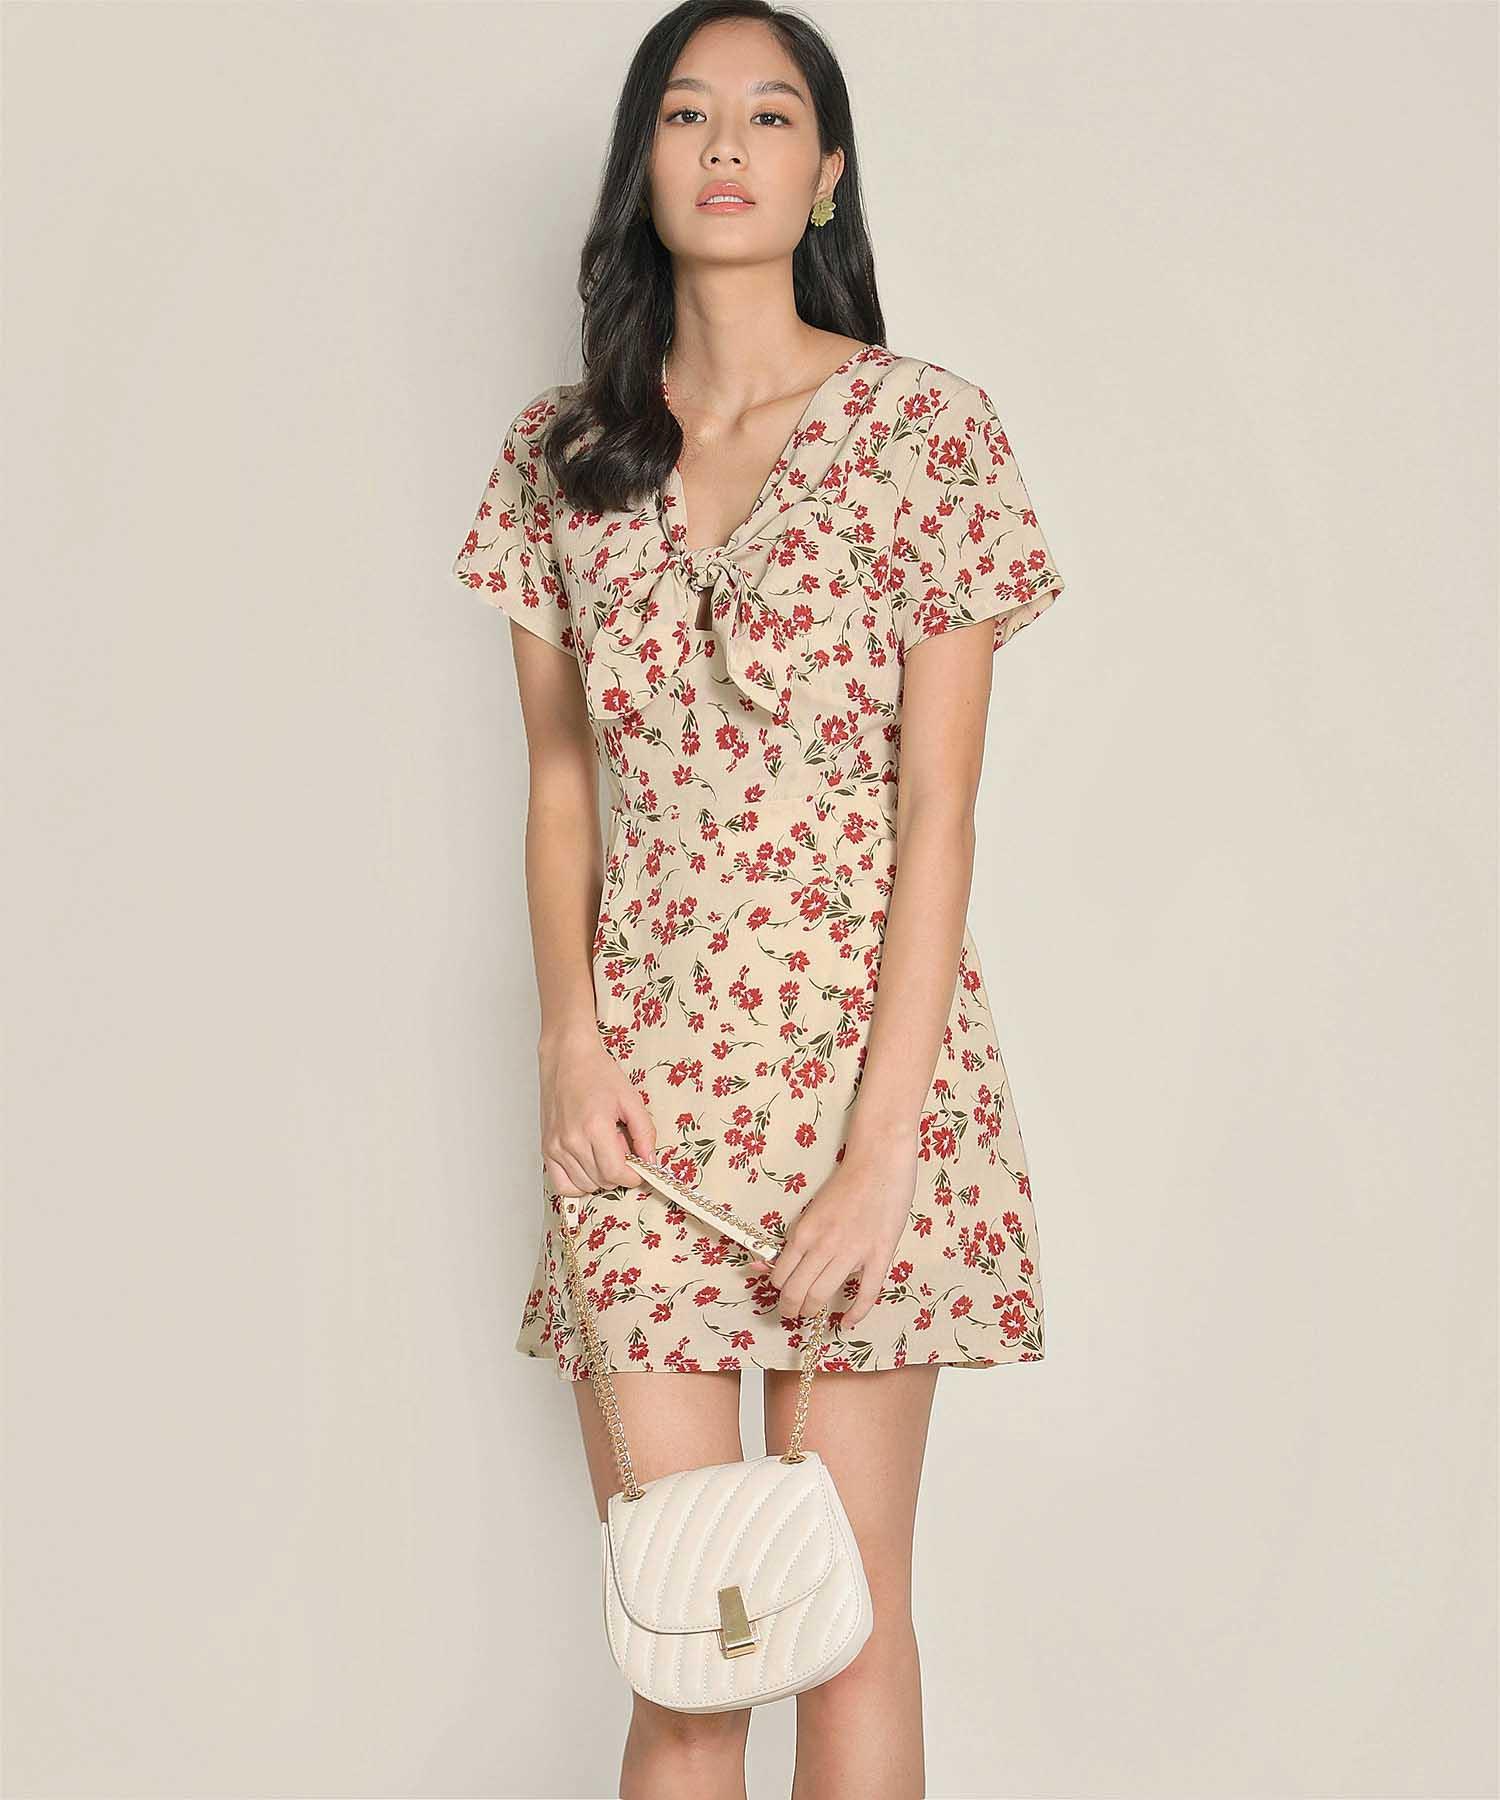 clemence-floral-dress-beige-1